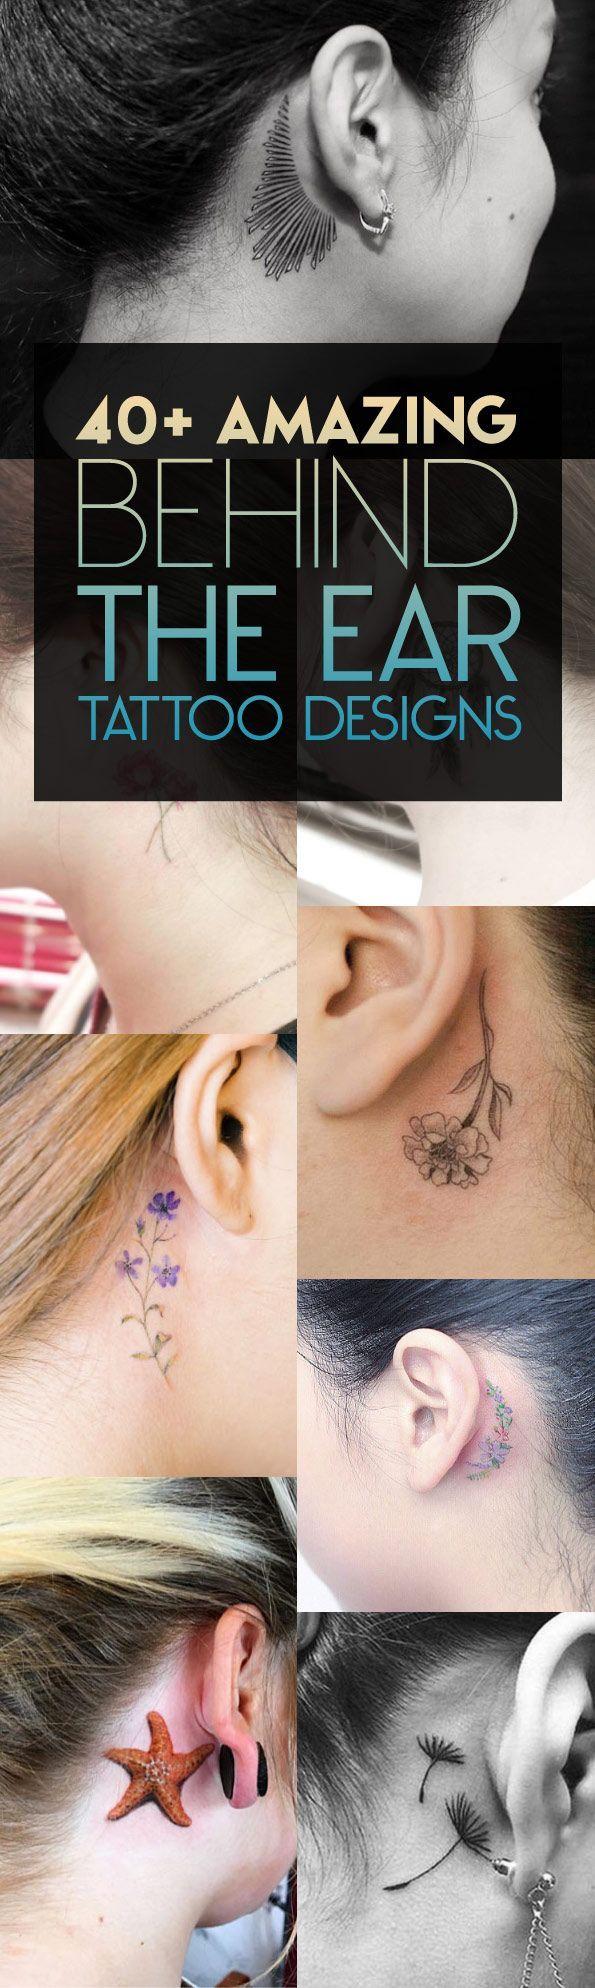 Chiquis Rivera Tattoo Behind Ear